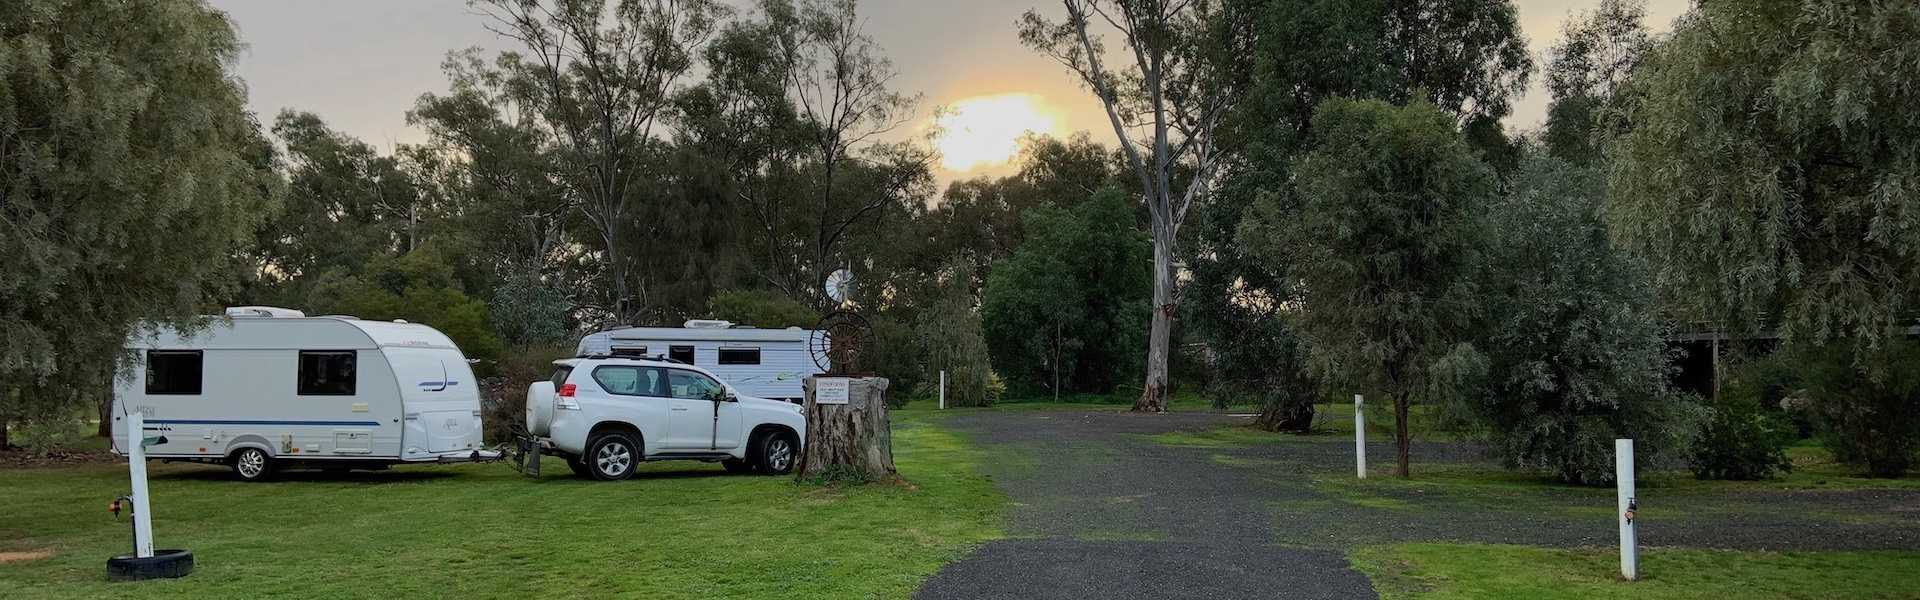 Kui Parks, Travellers Rest Caravan Park, Charlton VIC